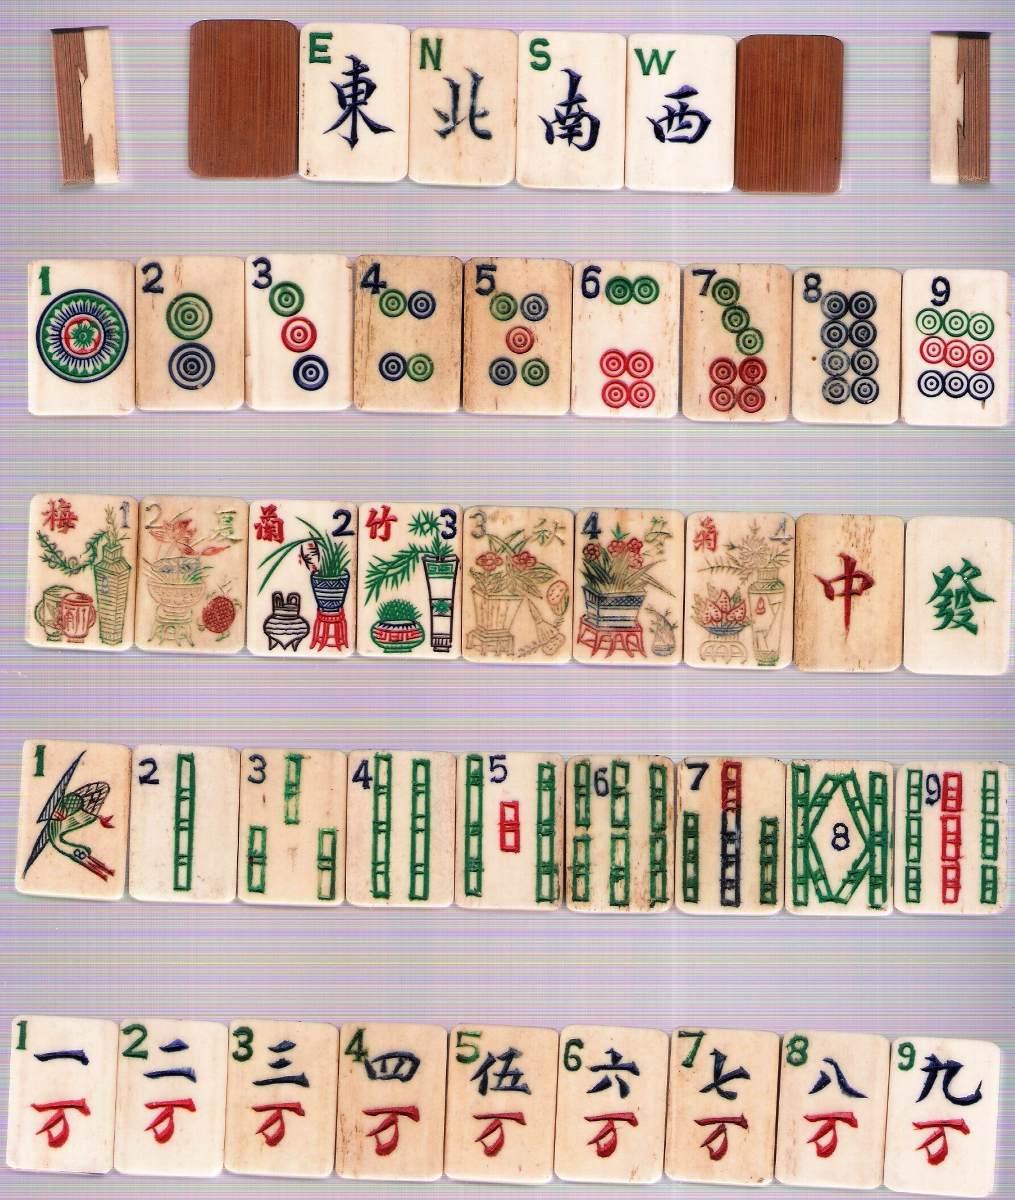 155 Fichas Antiguas Simil Marfil Juego Mahjong Origen China